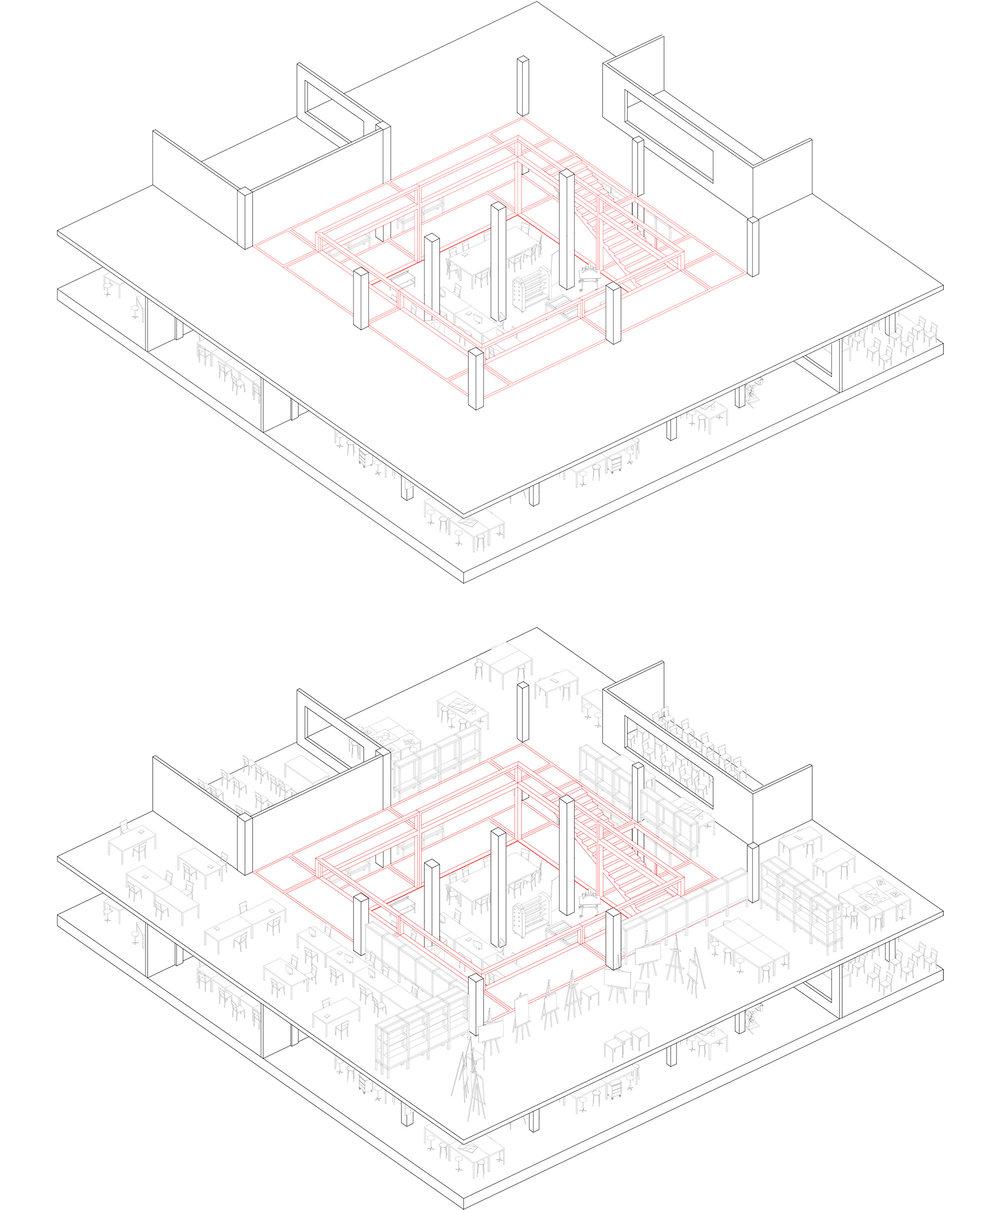 concept02_mvk.jpg